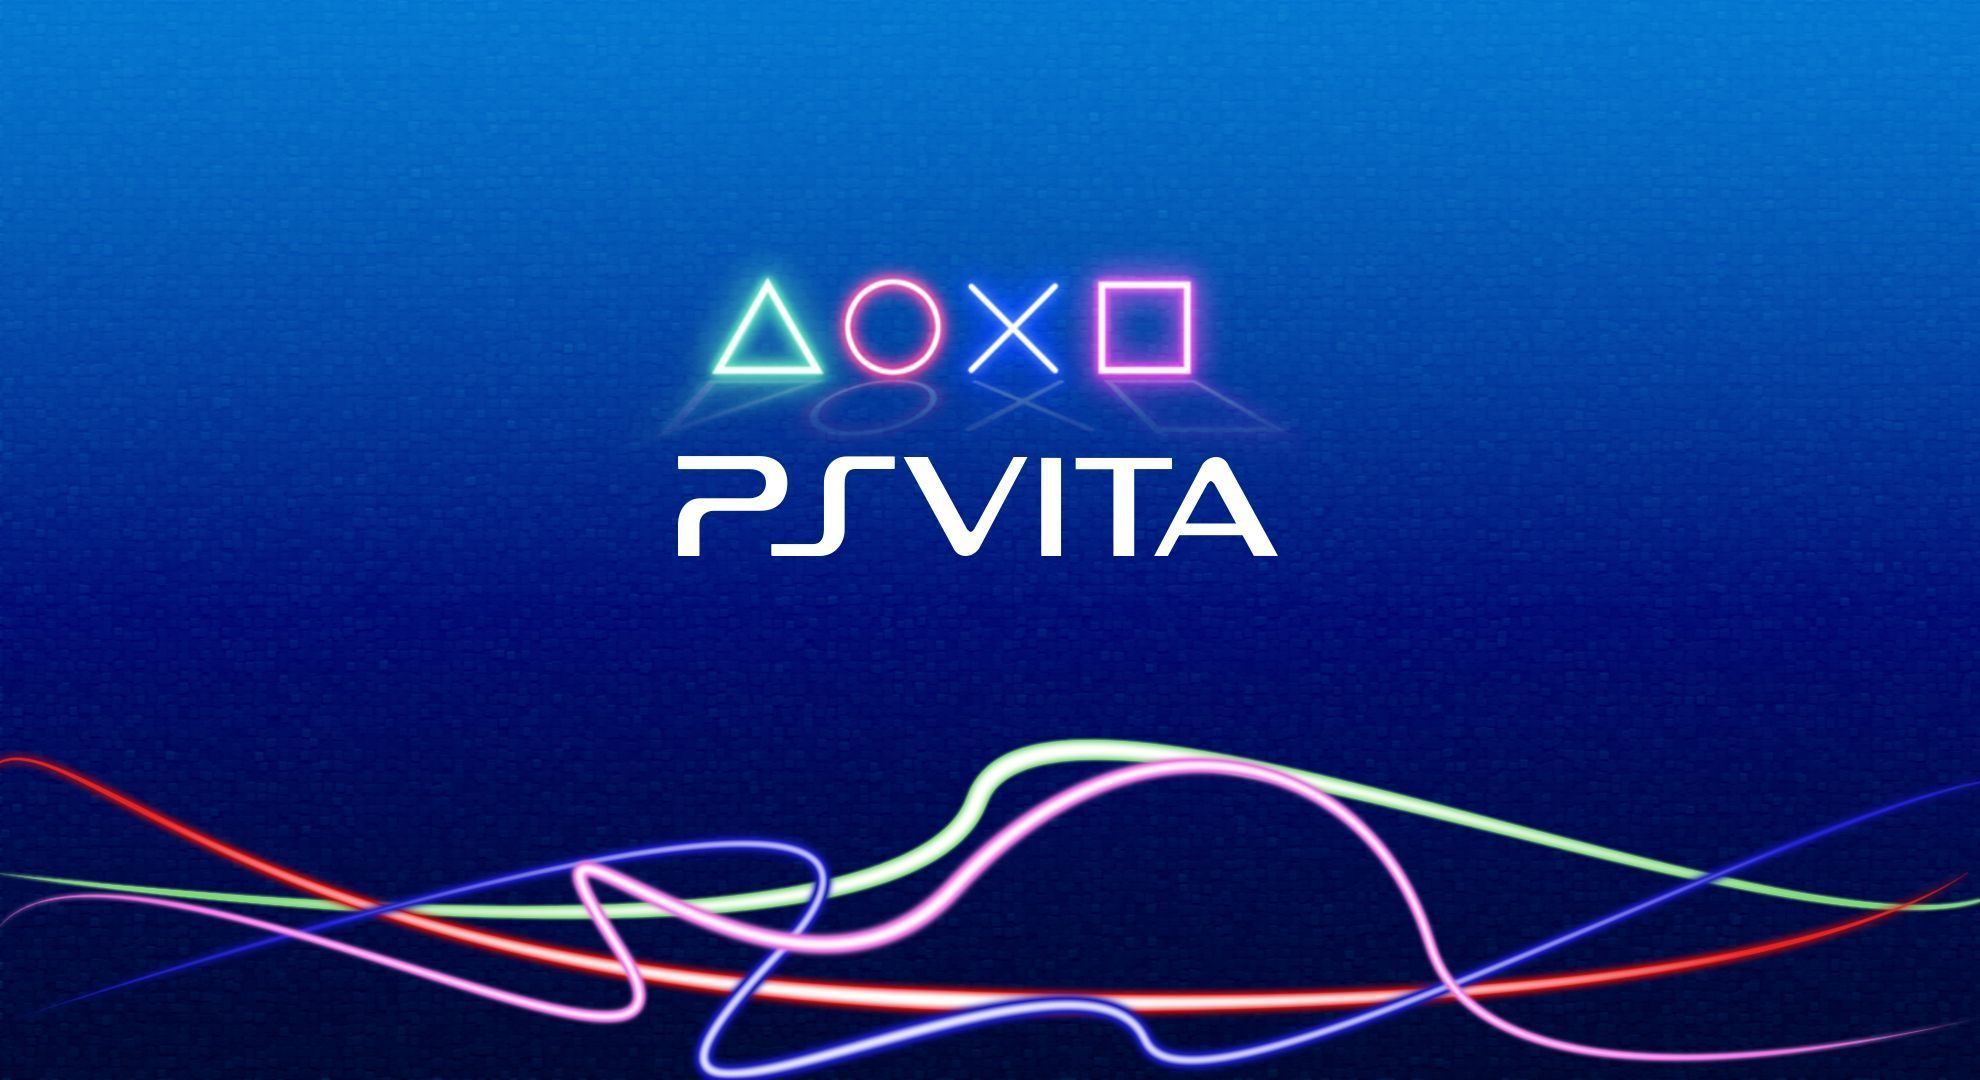 revolution PS Vita Wallpapers Free PS Vita Themes and